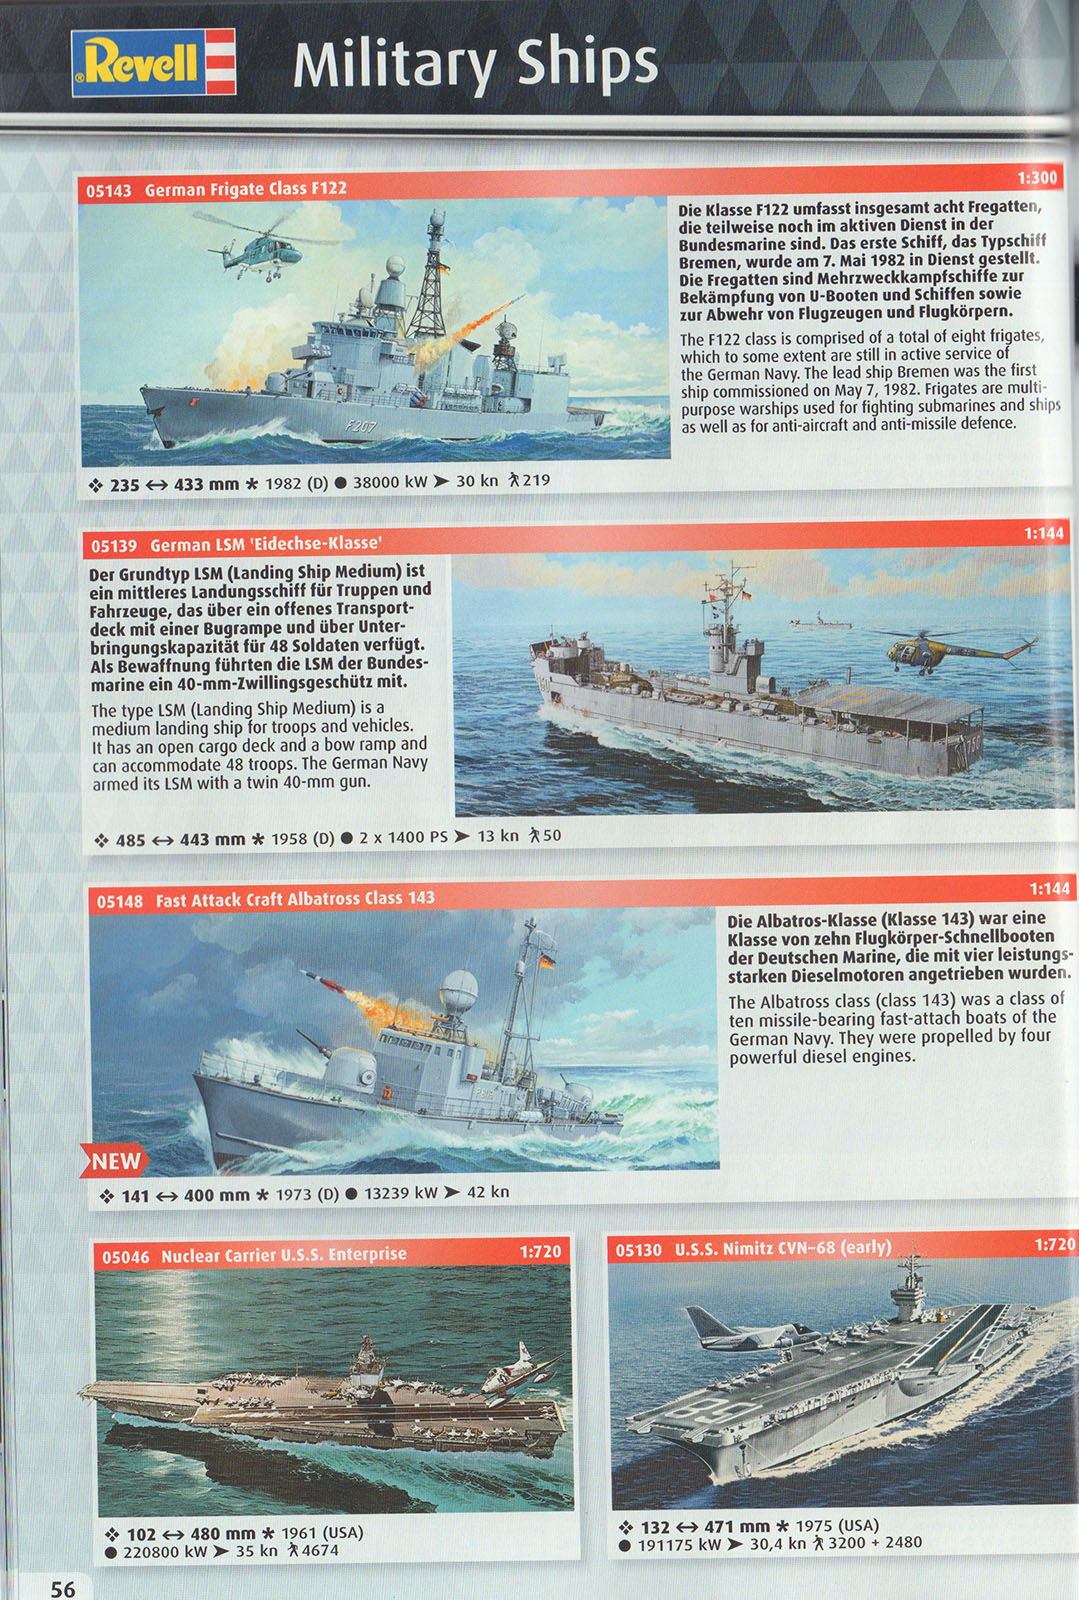 Mirage U-Boot RO-506 506 U-IX D1 ex U-195 Japan Japanisches Modell-Bausatz 1:400